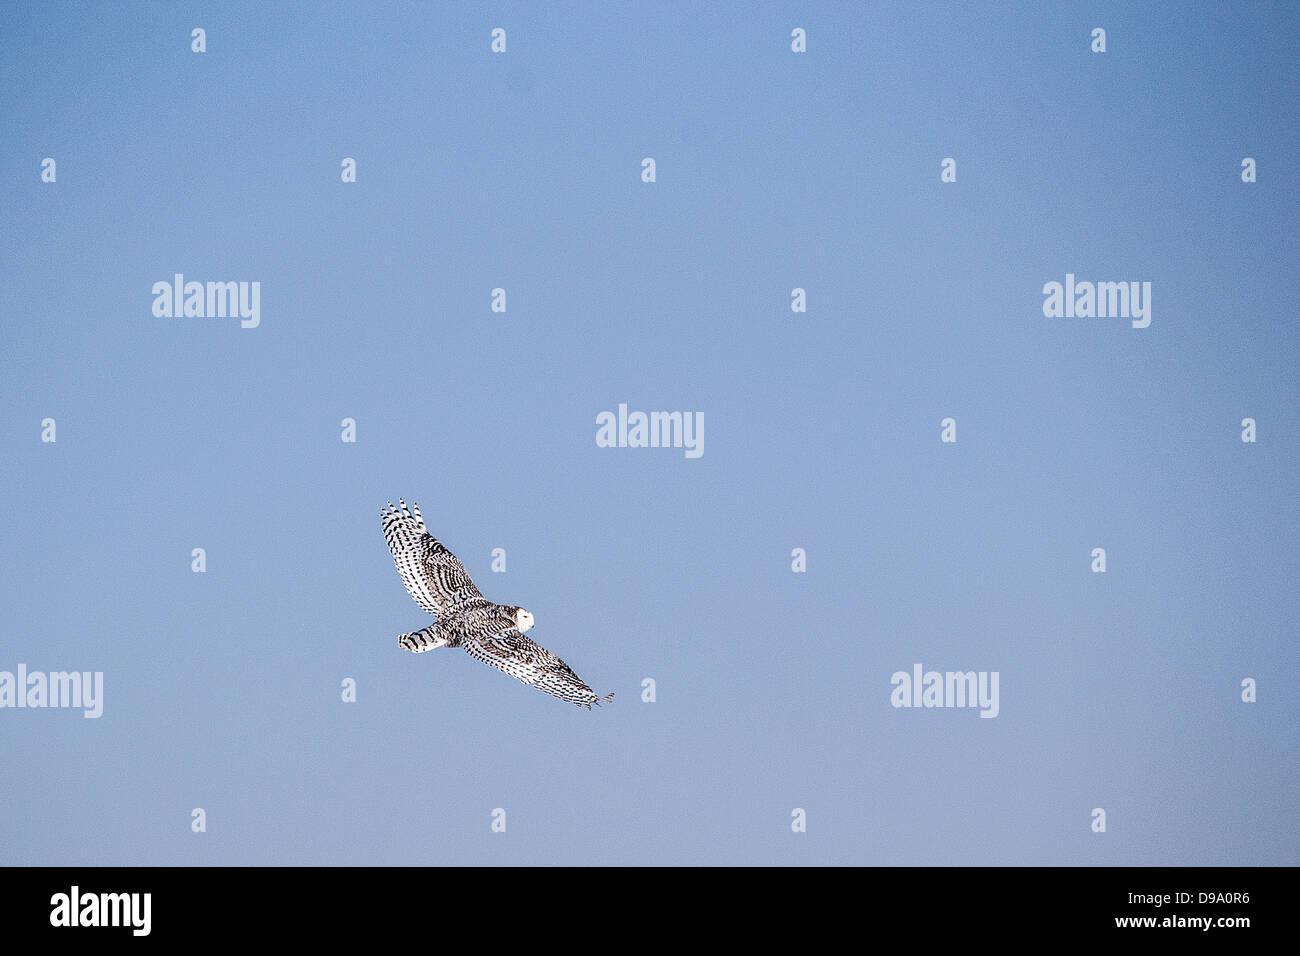 The Snowy Owl (Bubo scandiacus),  Strigidae,Carolus Linnaeus, Winter, Alberta, Wild, Canada, north - Stock Image